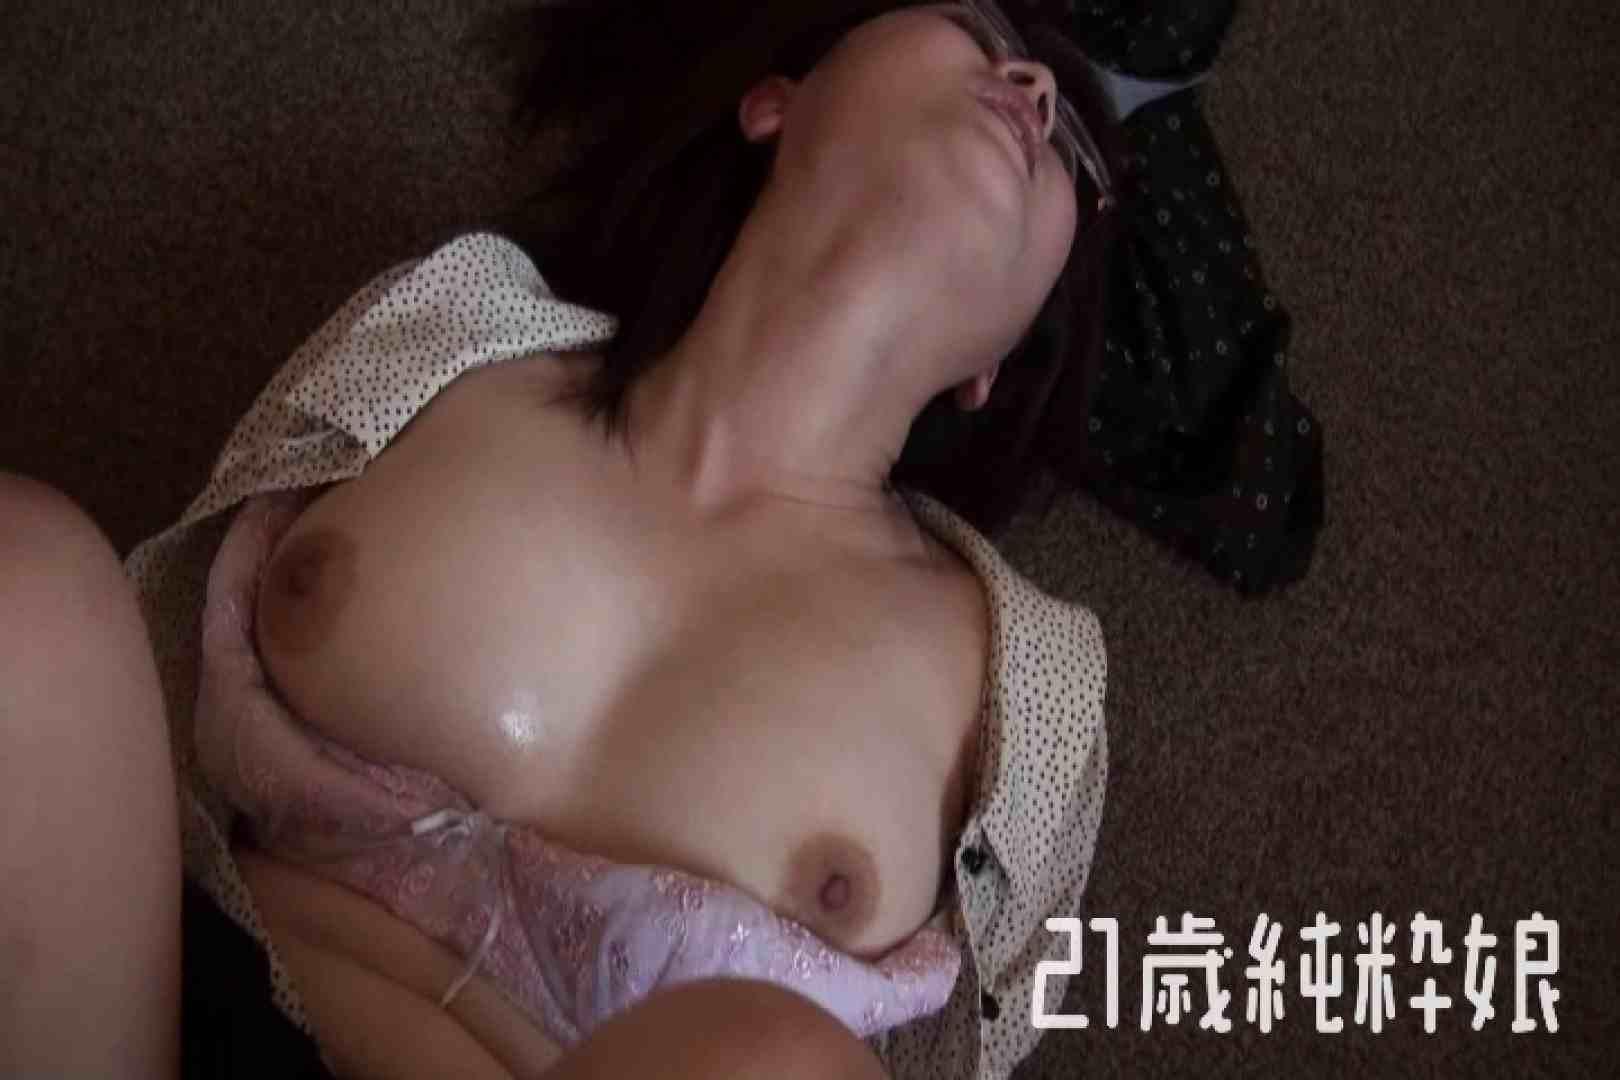 Gカップ21歳純粋嬢第2弾Vol.3 エッチなOL  50pic 39